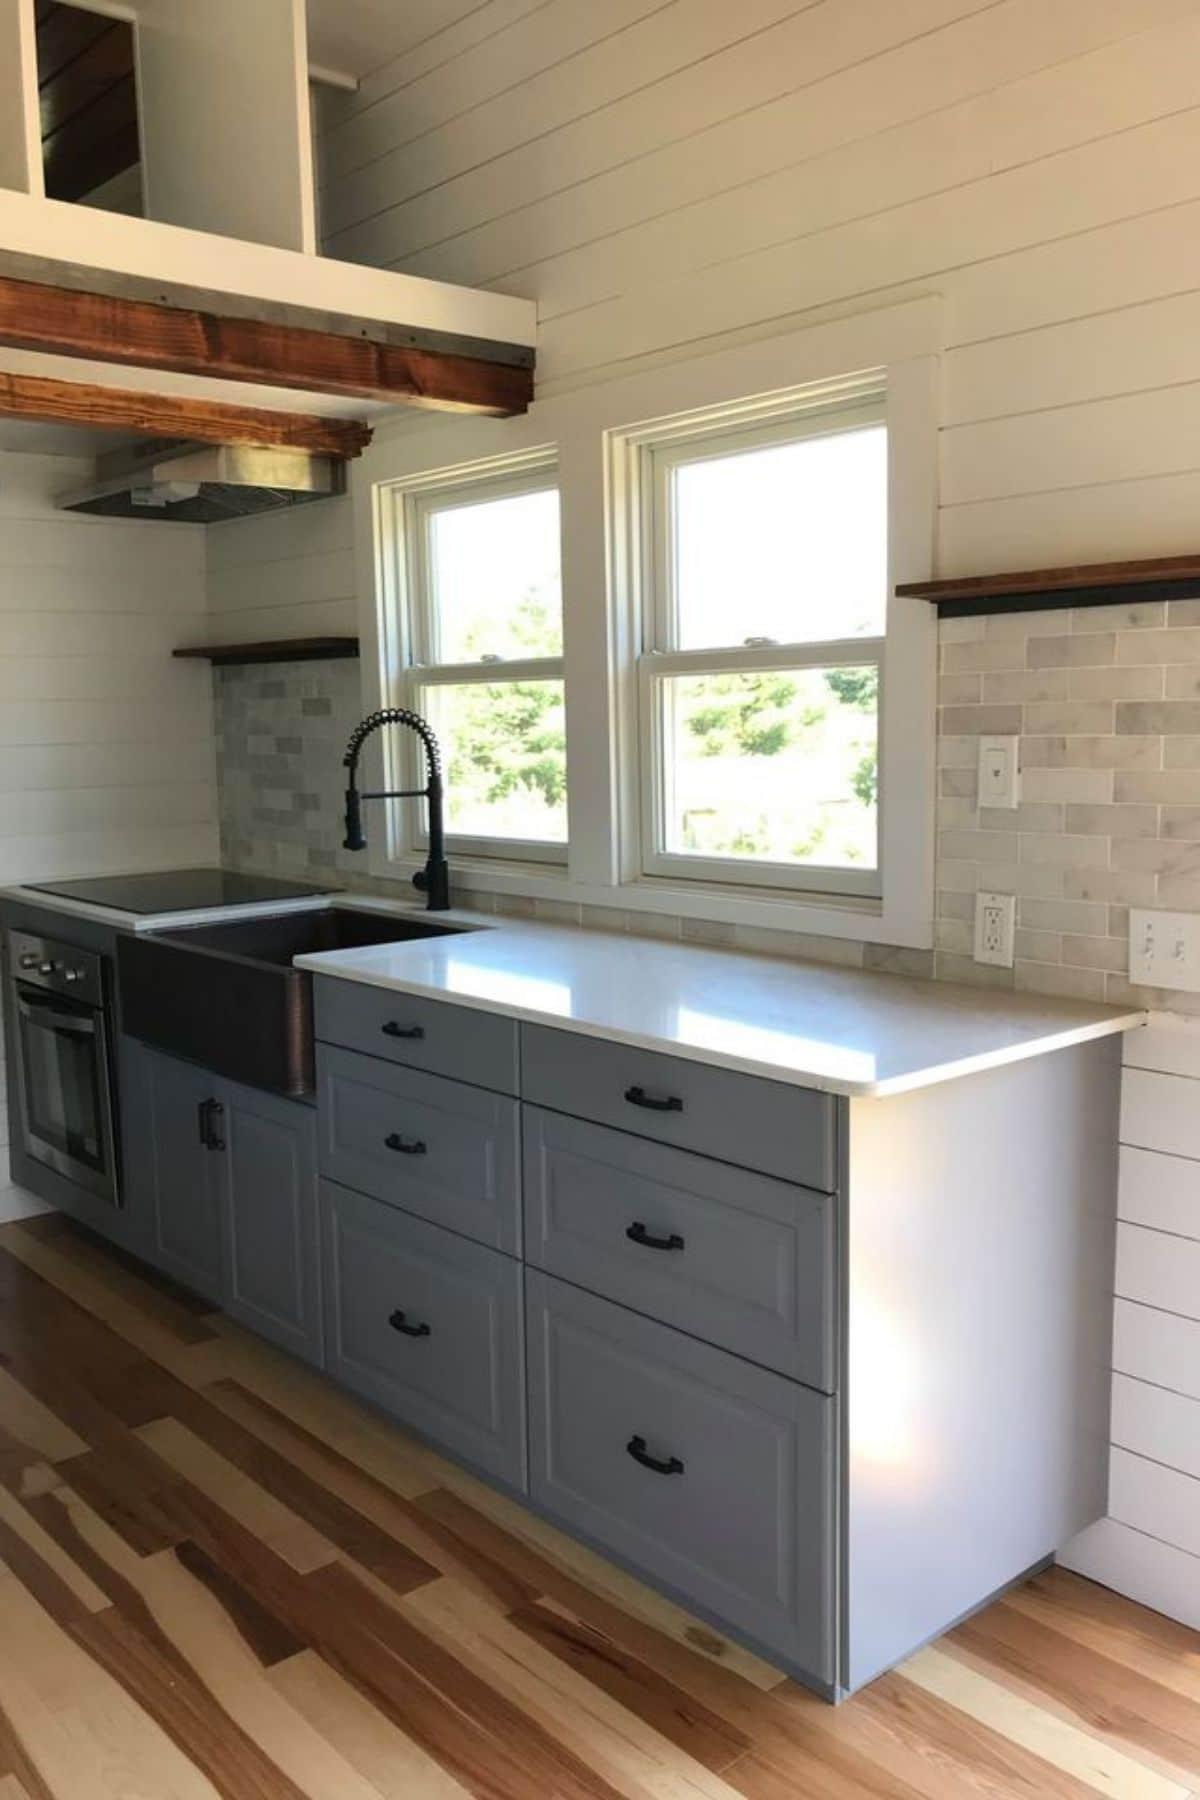 Gray kitchen cabinets with tile backsplash